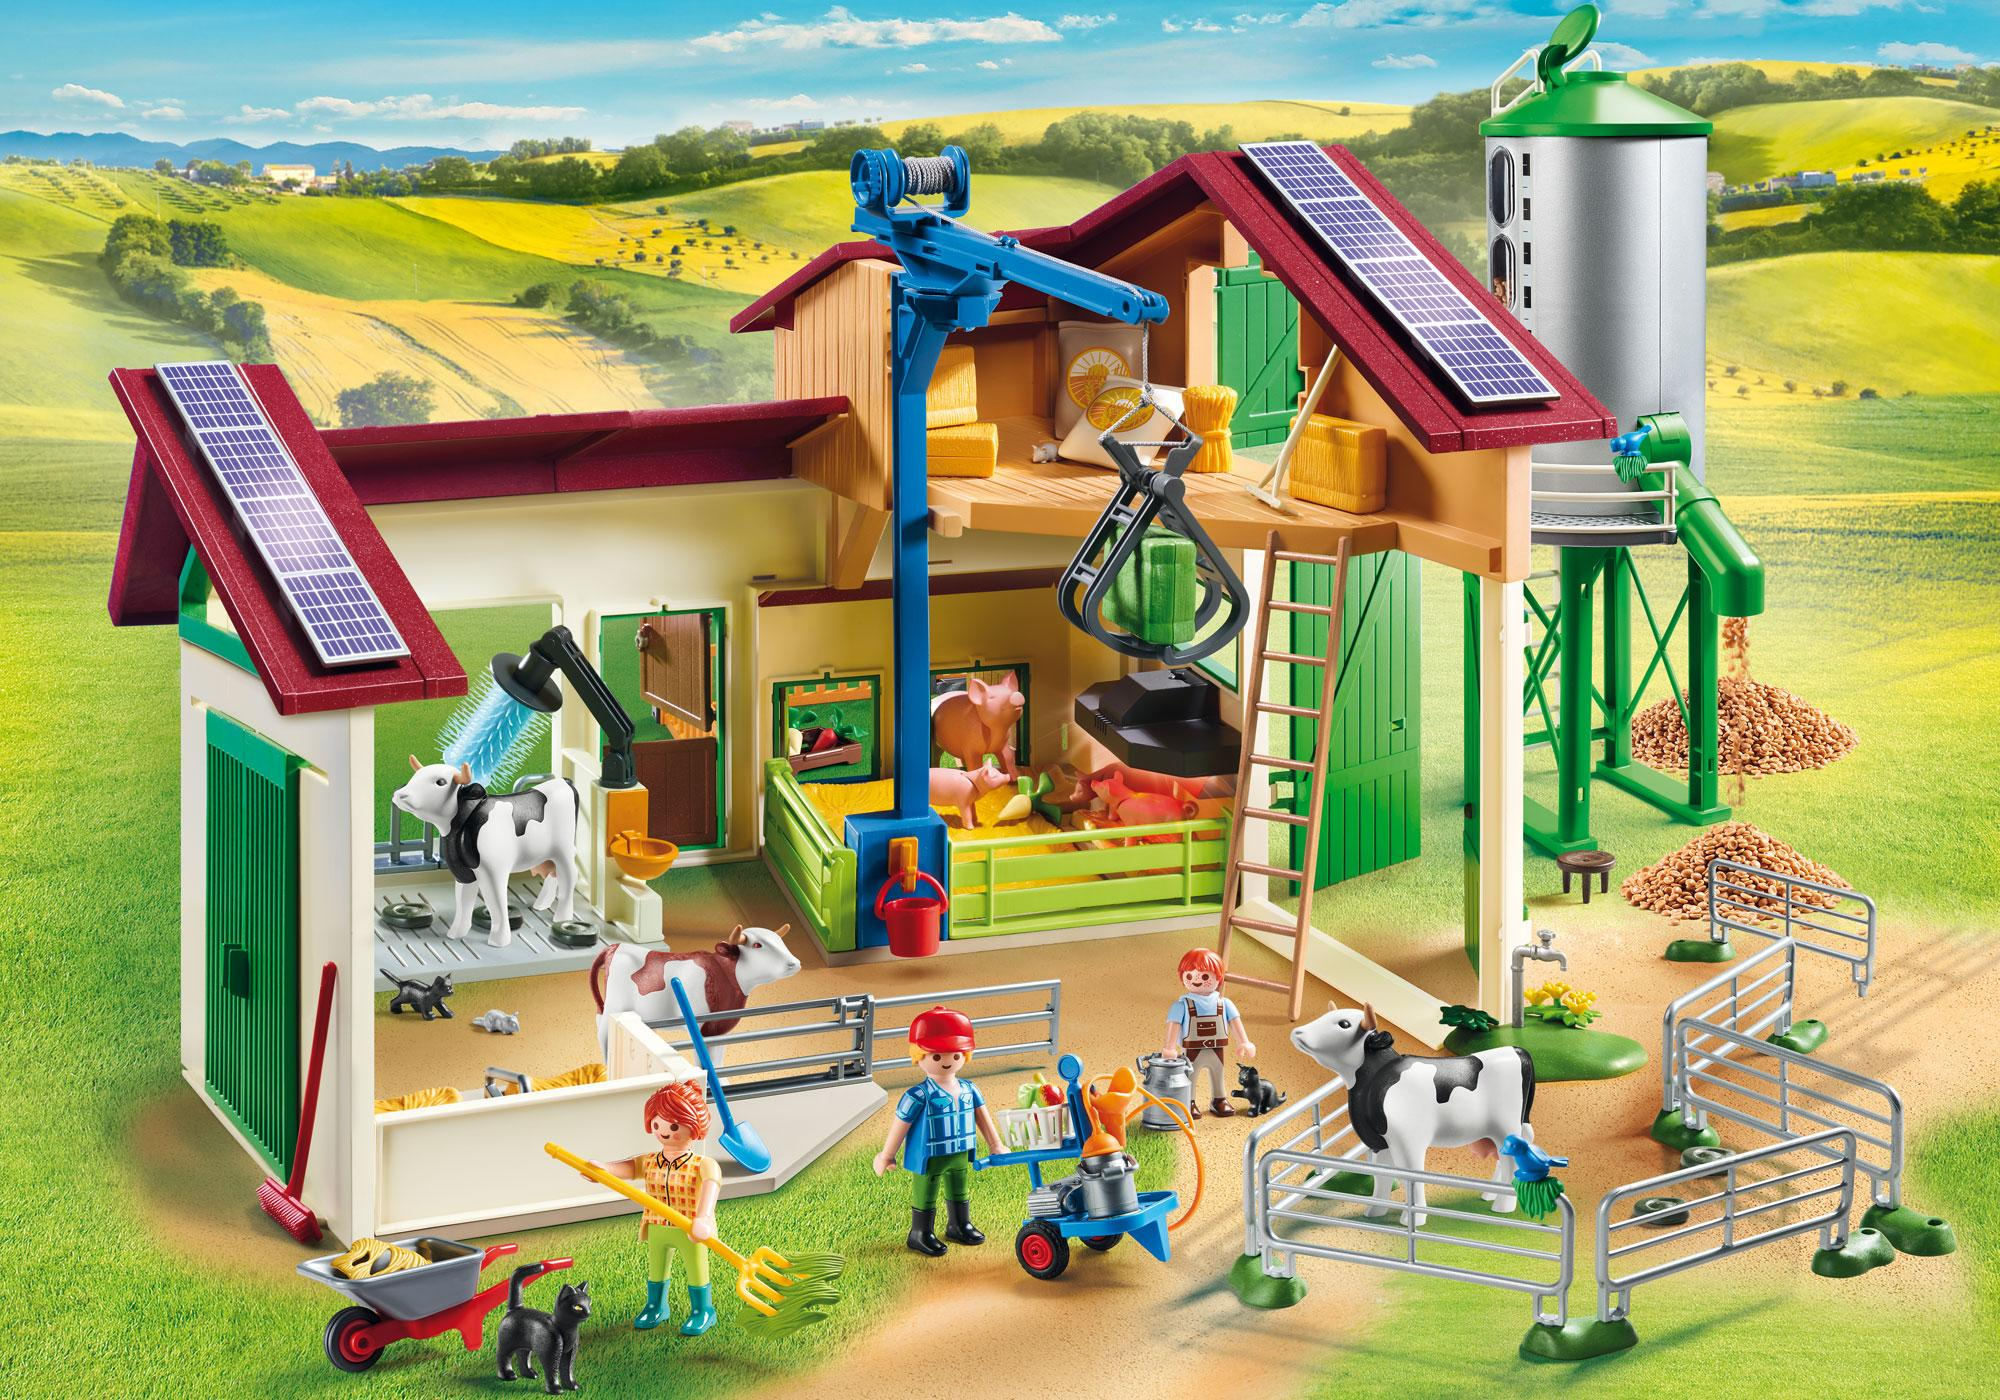 70132_product_detail/Boerderij met silo en dieren